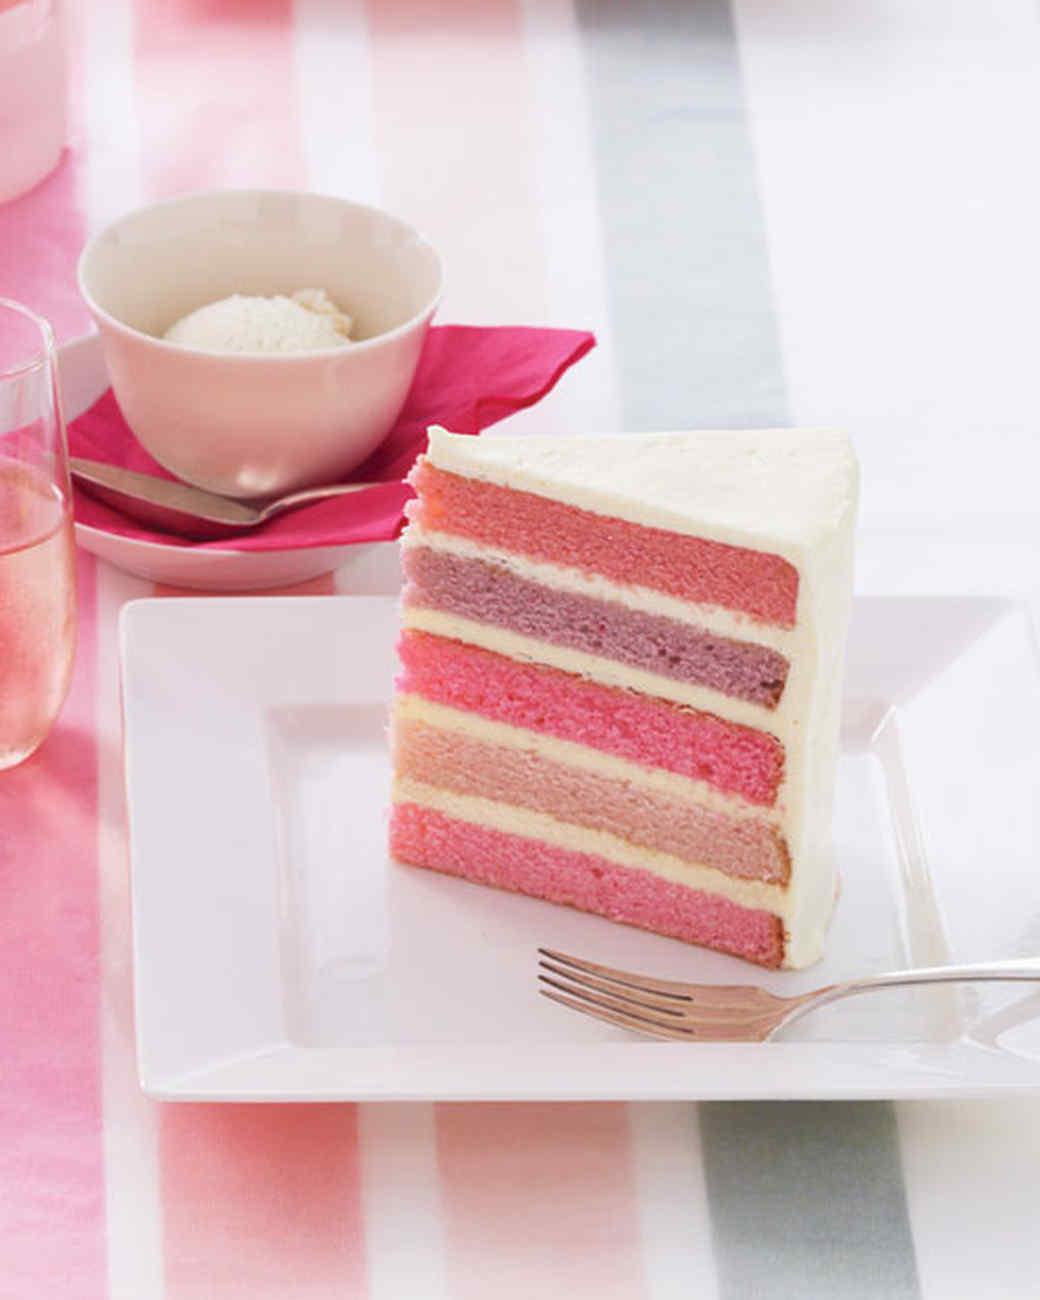 mld106559_0111_color_cake.jpg